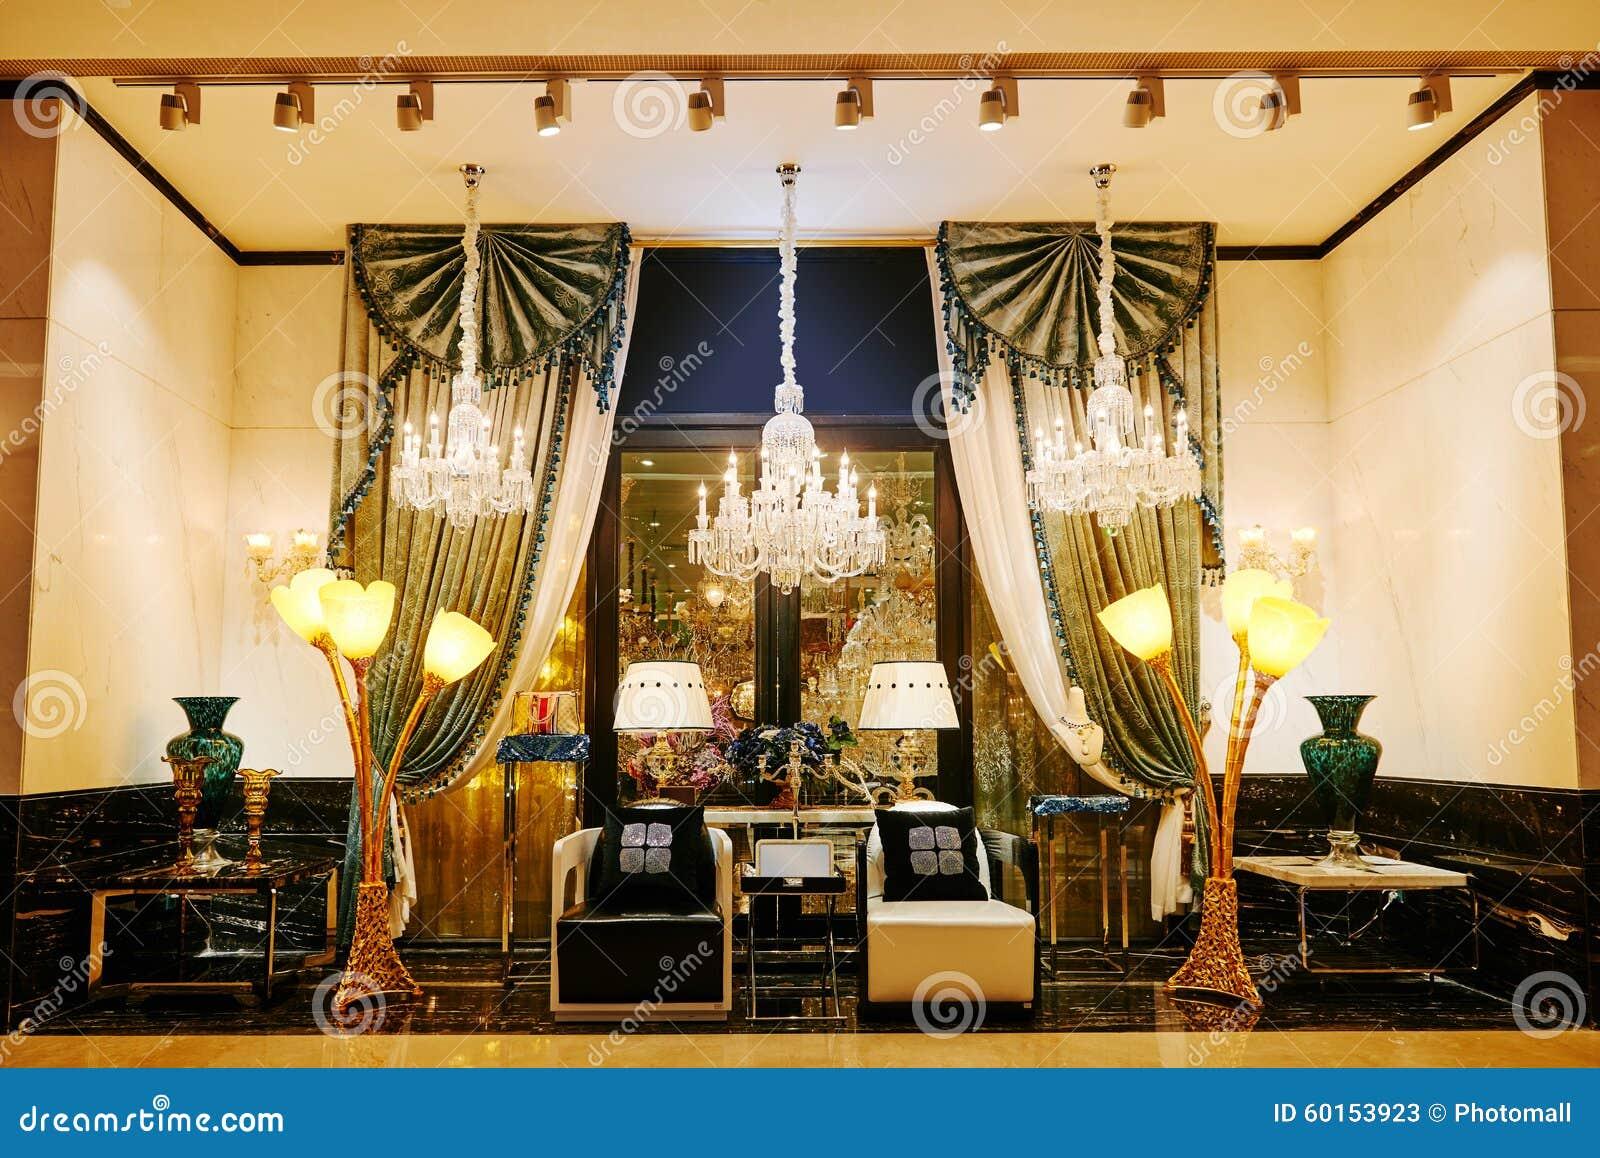 Dubuque Floor Show Furniture Outlet floor show outlet  : luxury lighting shop modern led showcase exhibit modern pendant lamps floor lights desk lamps show window 60153923 from autorecyclingwichita.com size 1300 x 958 jpeg 242kB